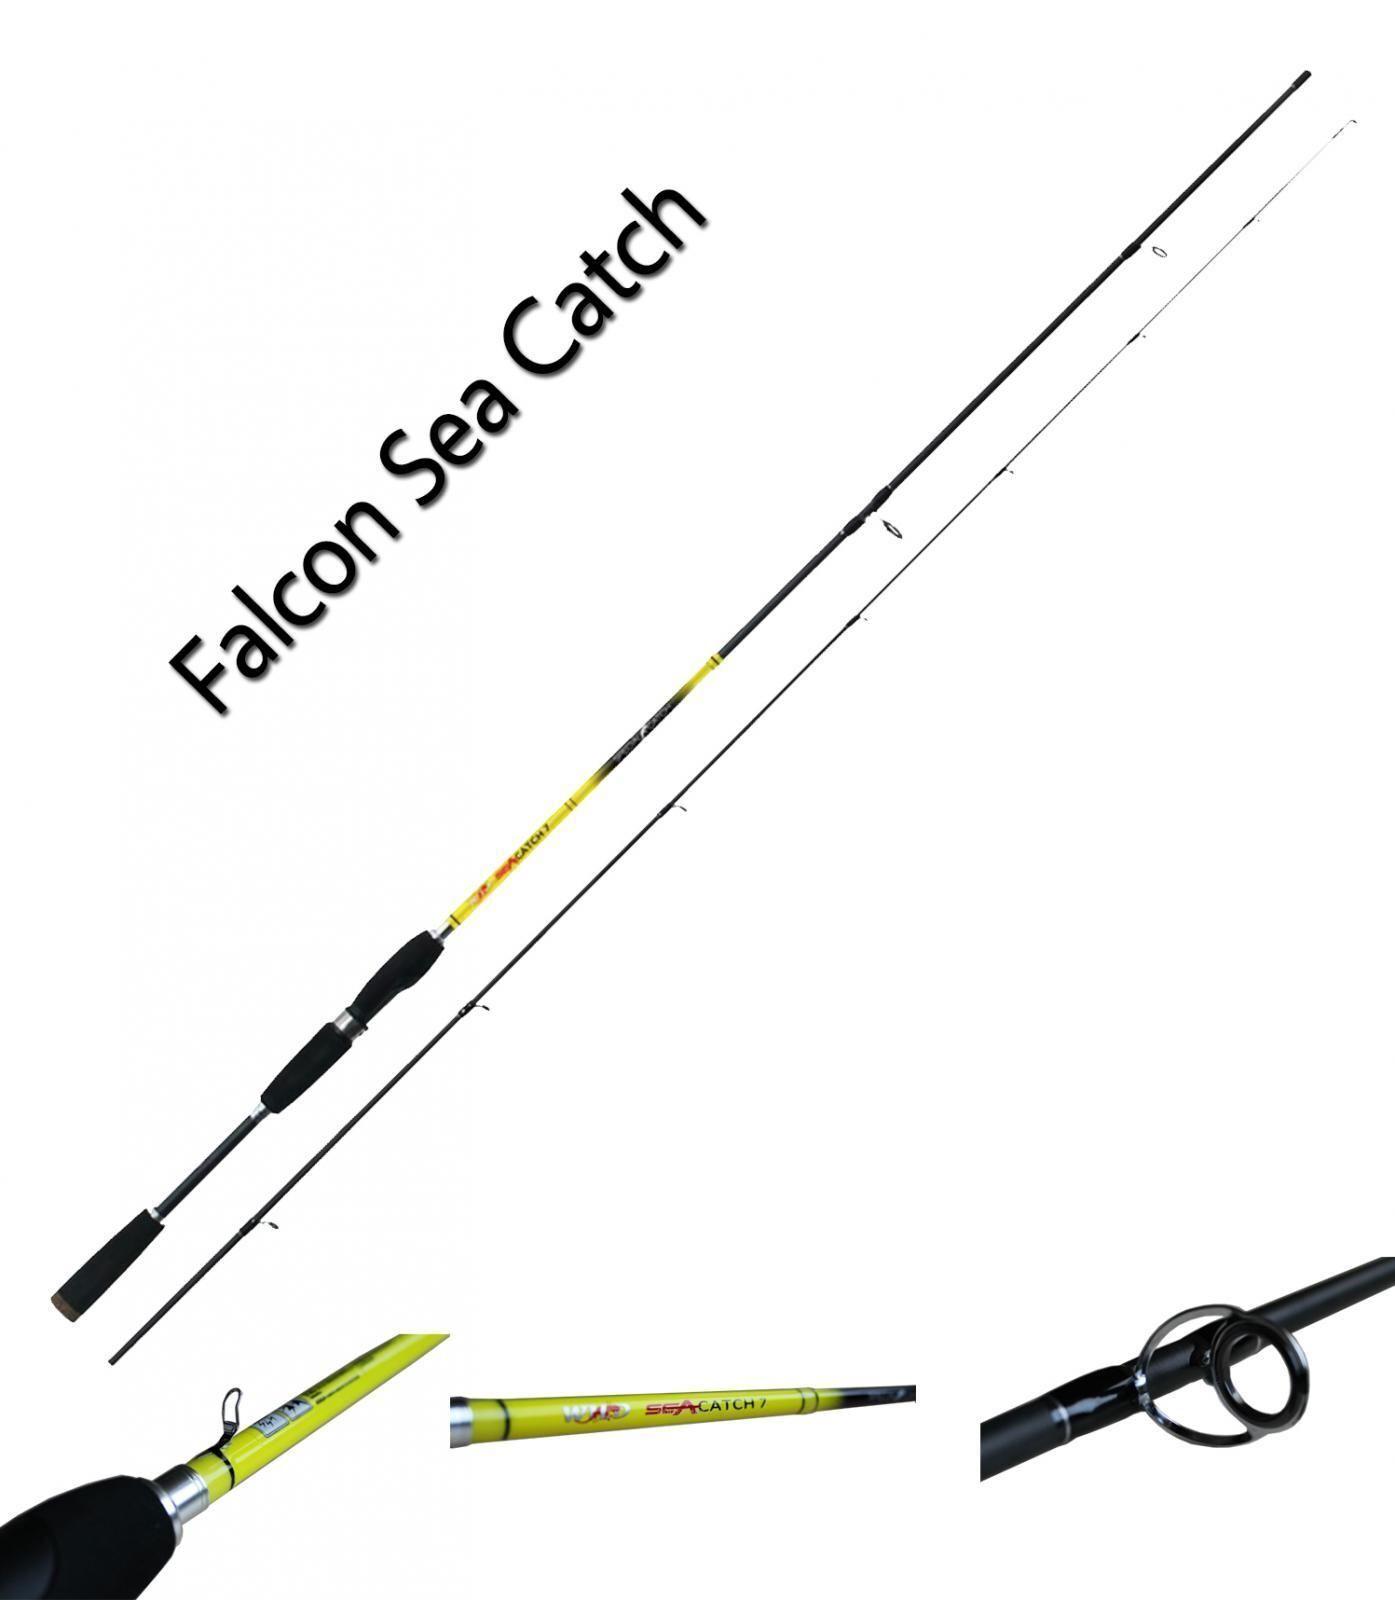 D0900237 Canna Falcon Sea Catch 240 Cm  3 15Gr Finesse Spoon Rock Fishing RN